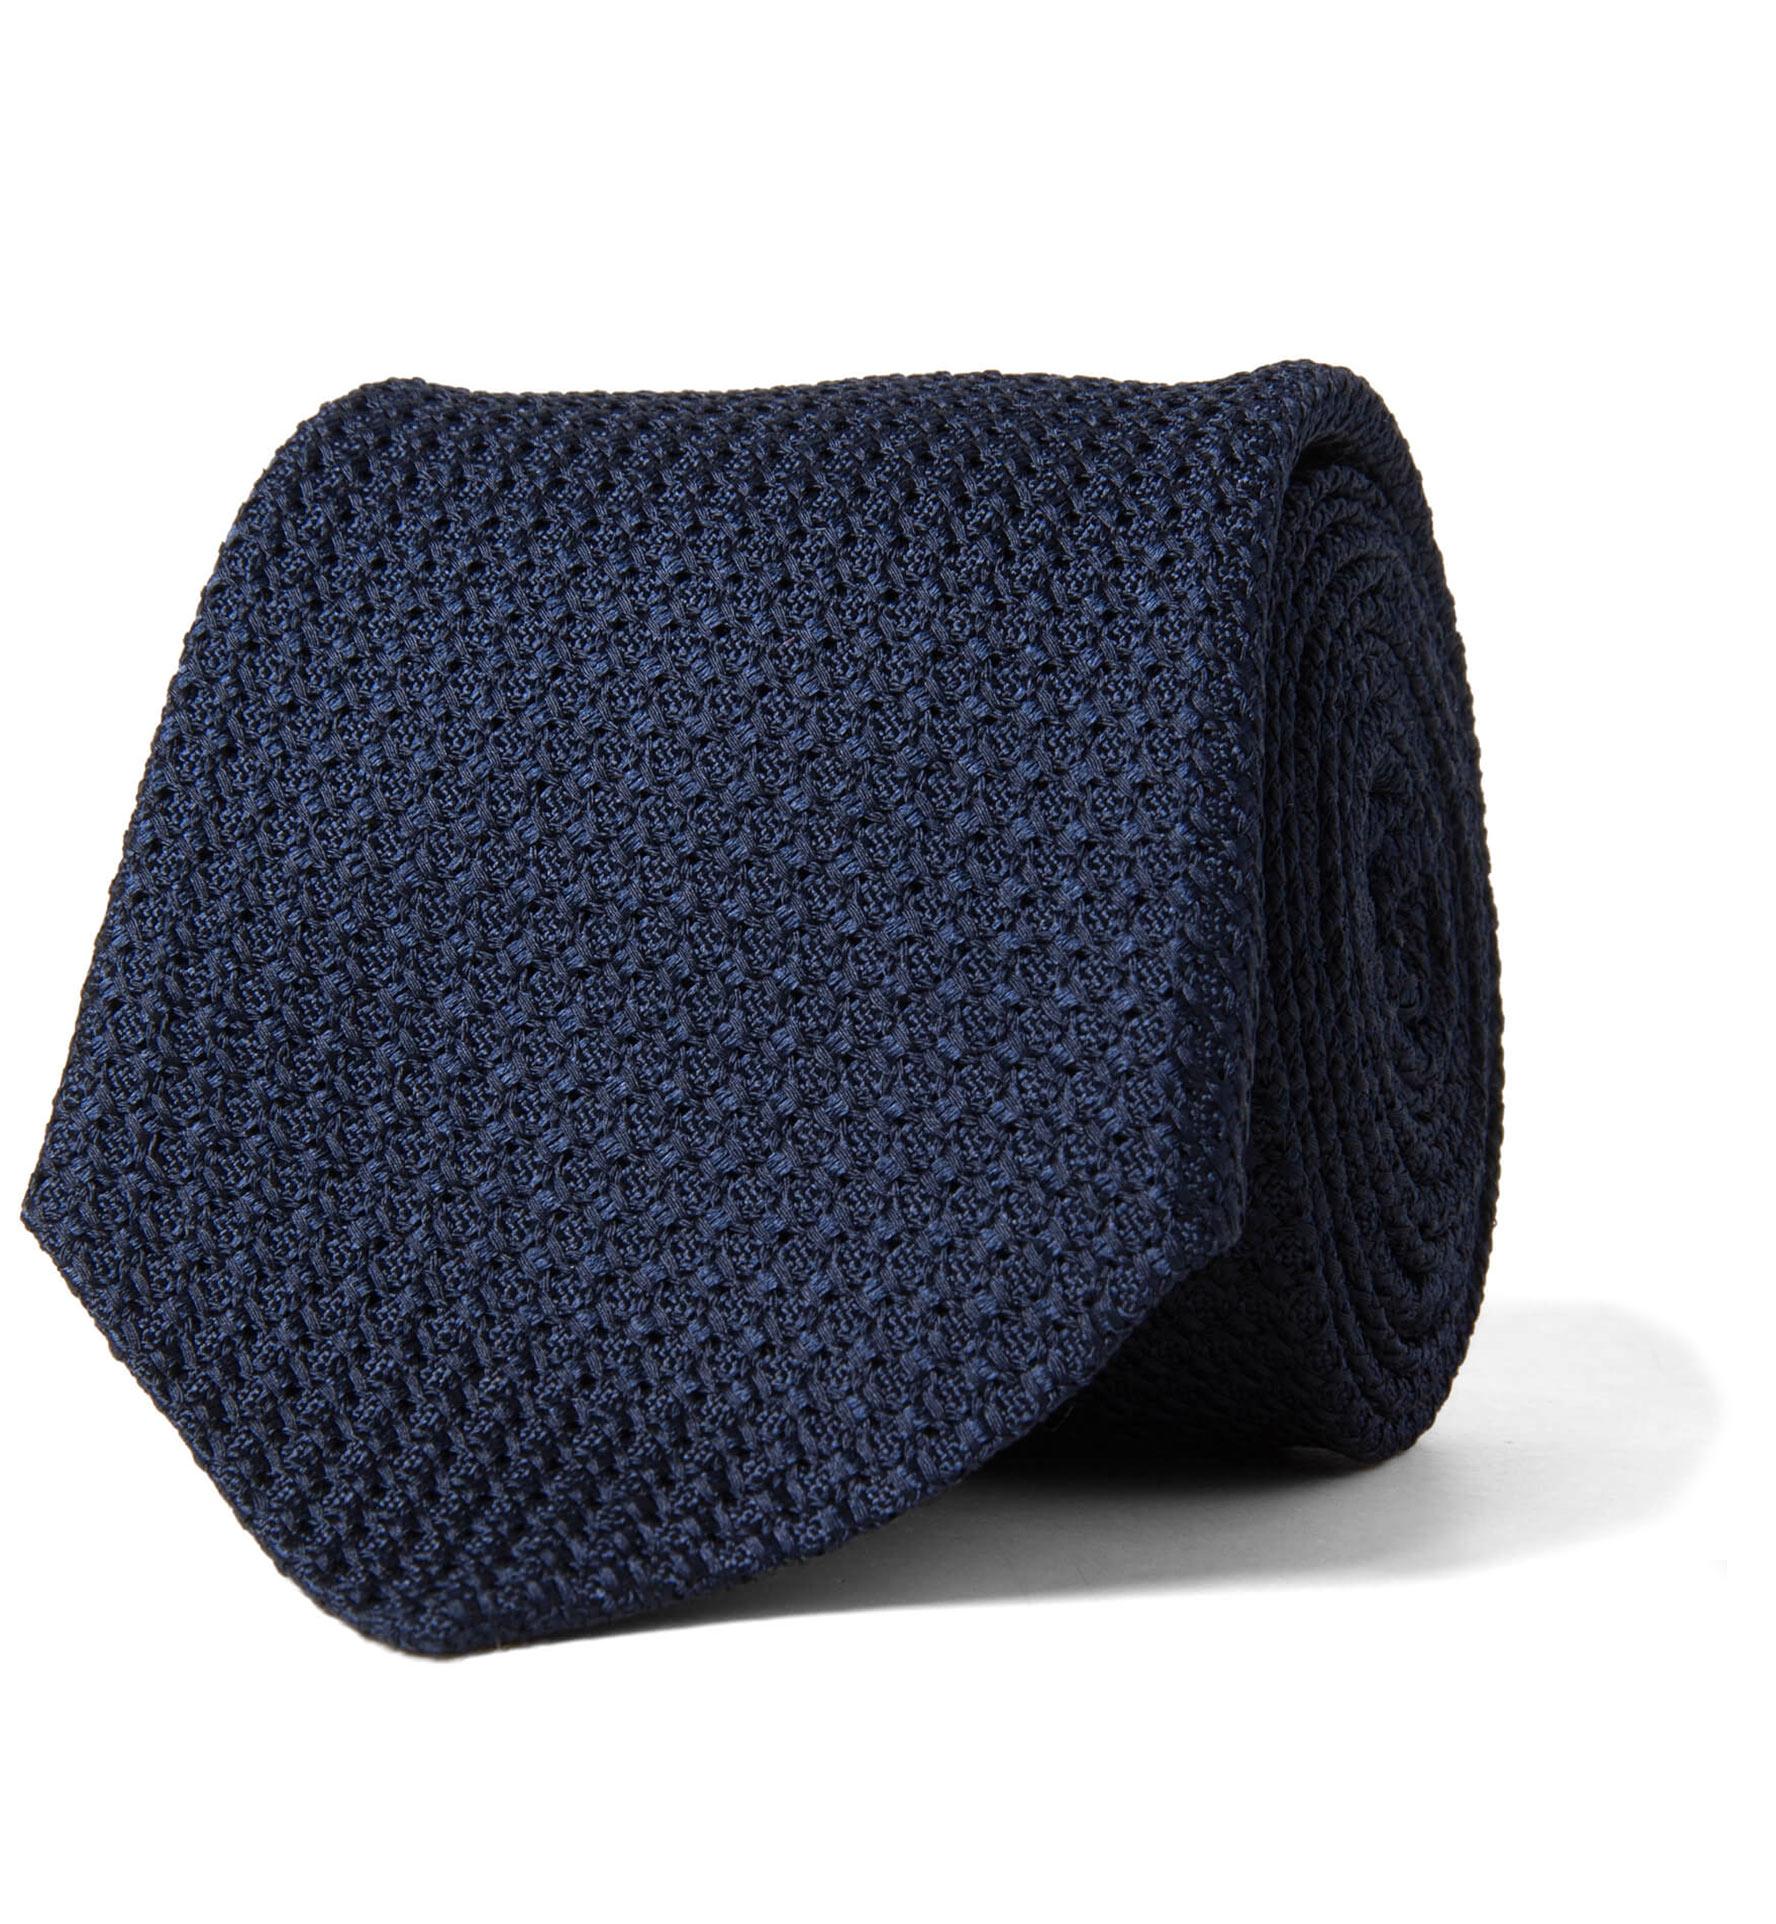 Zoom Image of Navy Silk Grenadine Tie